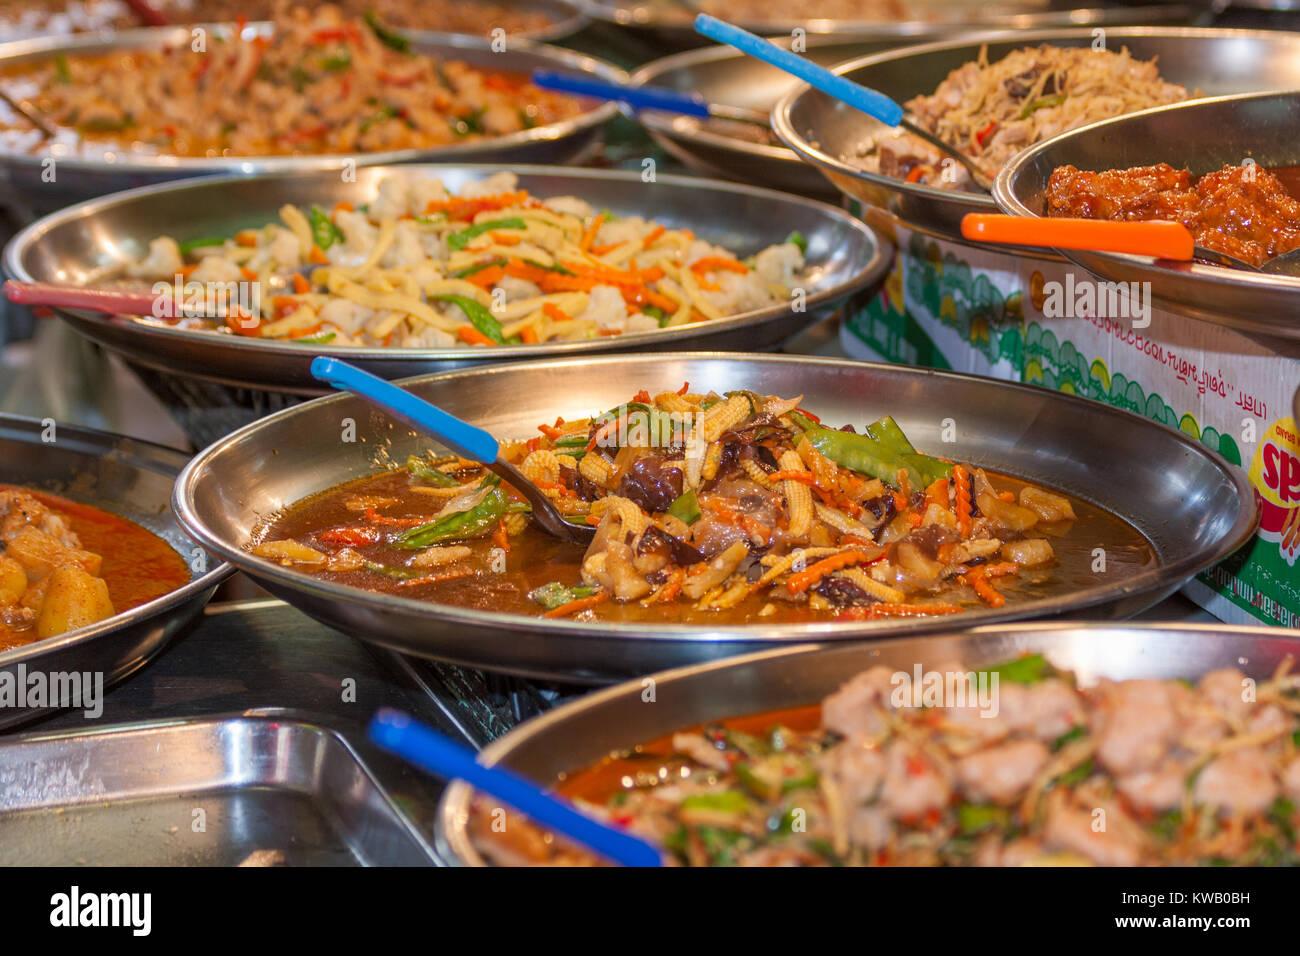 Platters of Thai food on a street food stall, Bangkok, Thailand - Stock Image